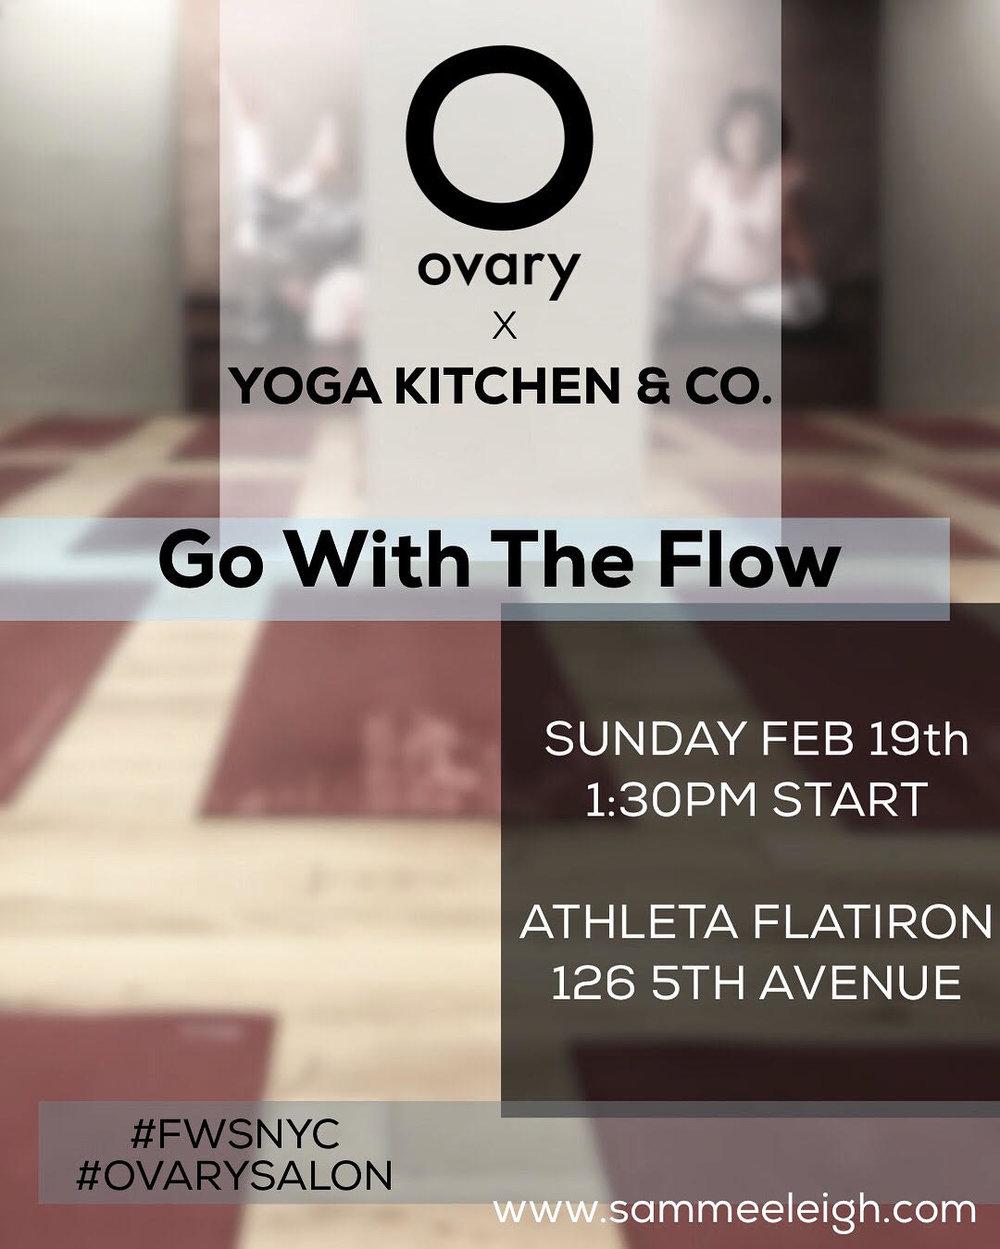 Yoga Kitchen event February 19th @ Athleta